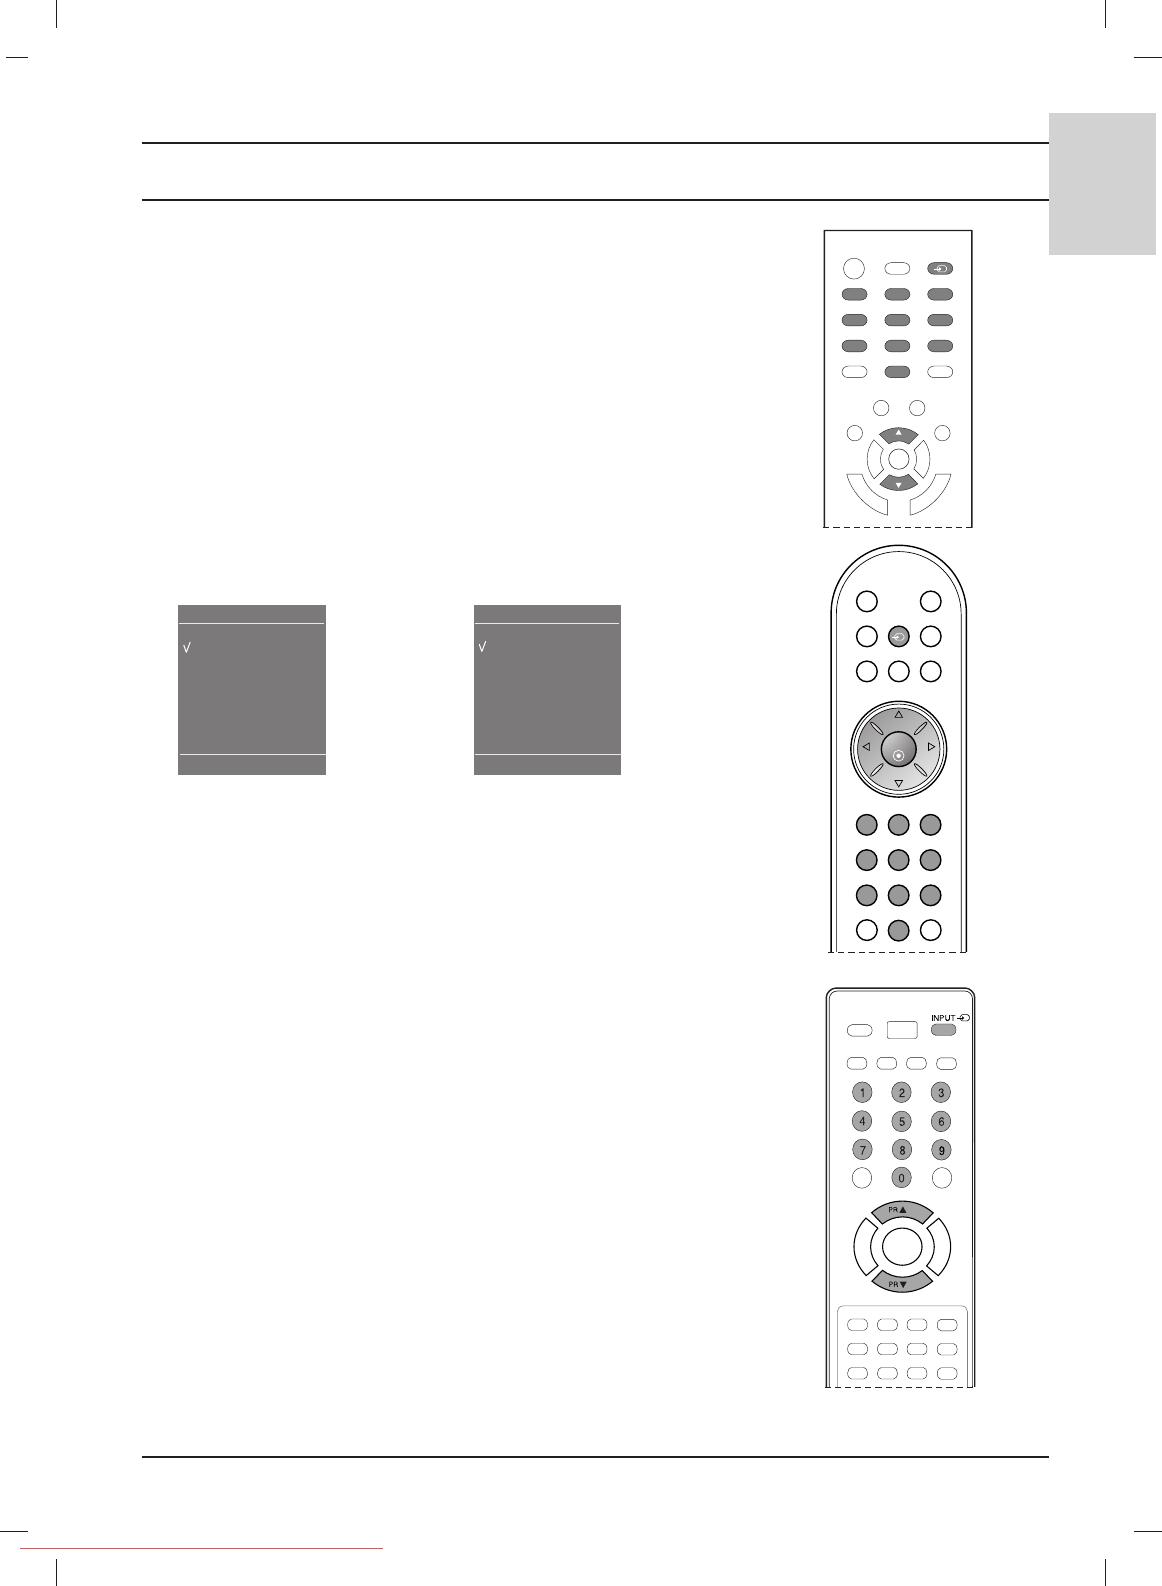 LG Electronics 15LC1R, 15LS1R, 20LC1R, 20LS1R, 20LS2R, 23LS2R TV, AV